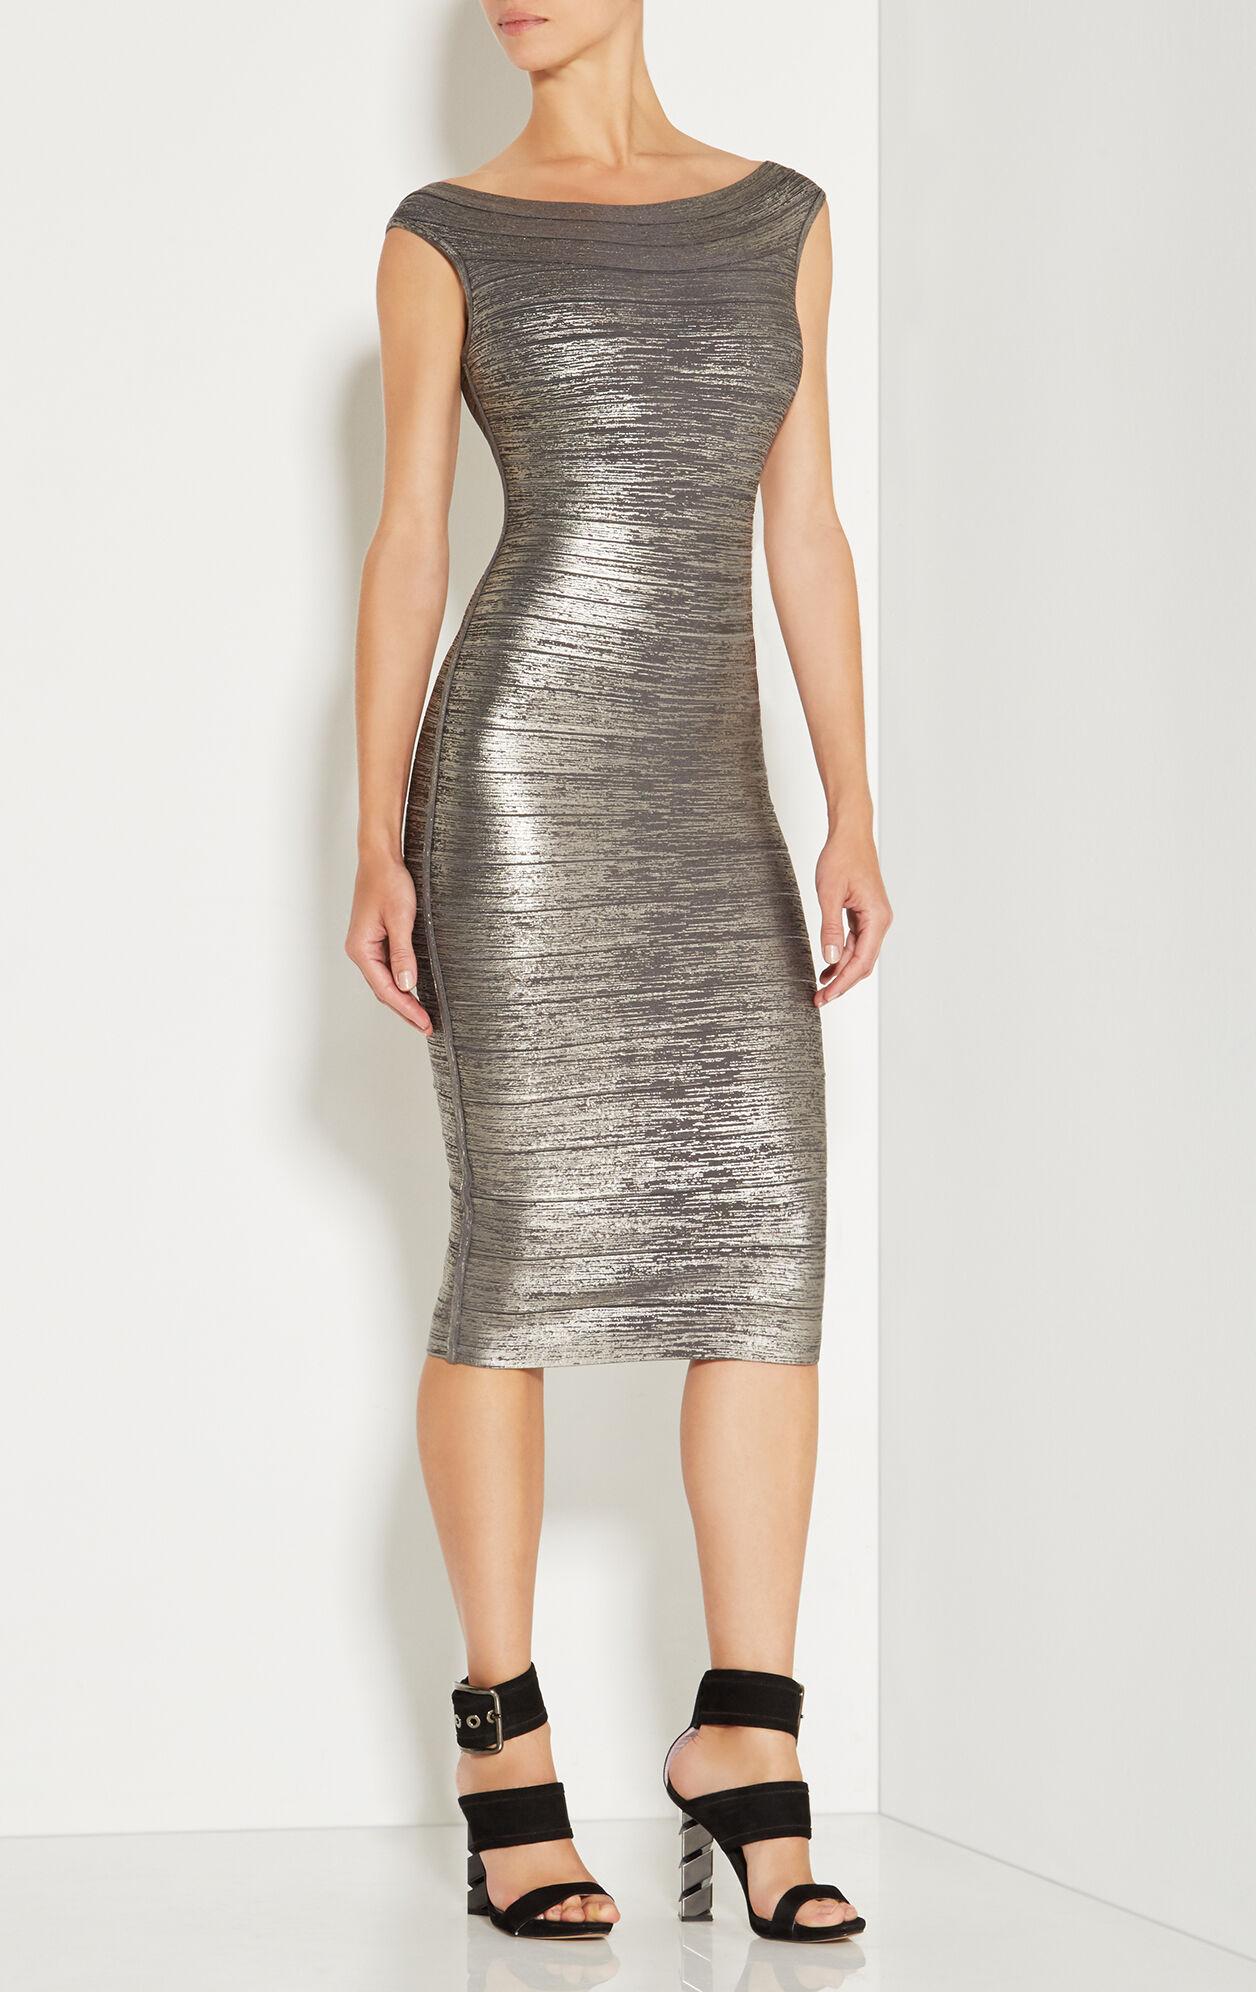 Ardell Woodgrain Foil Print Dress